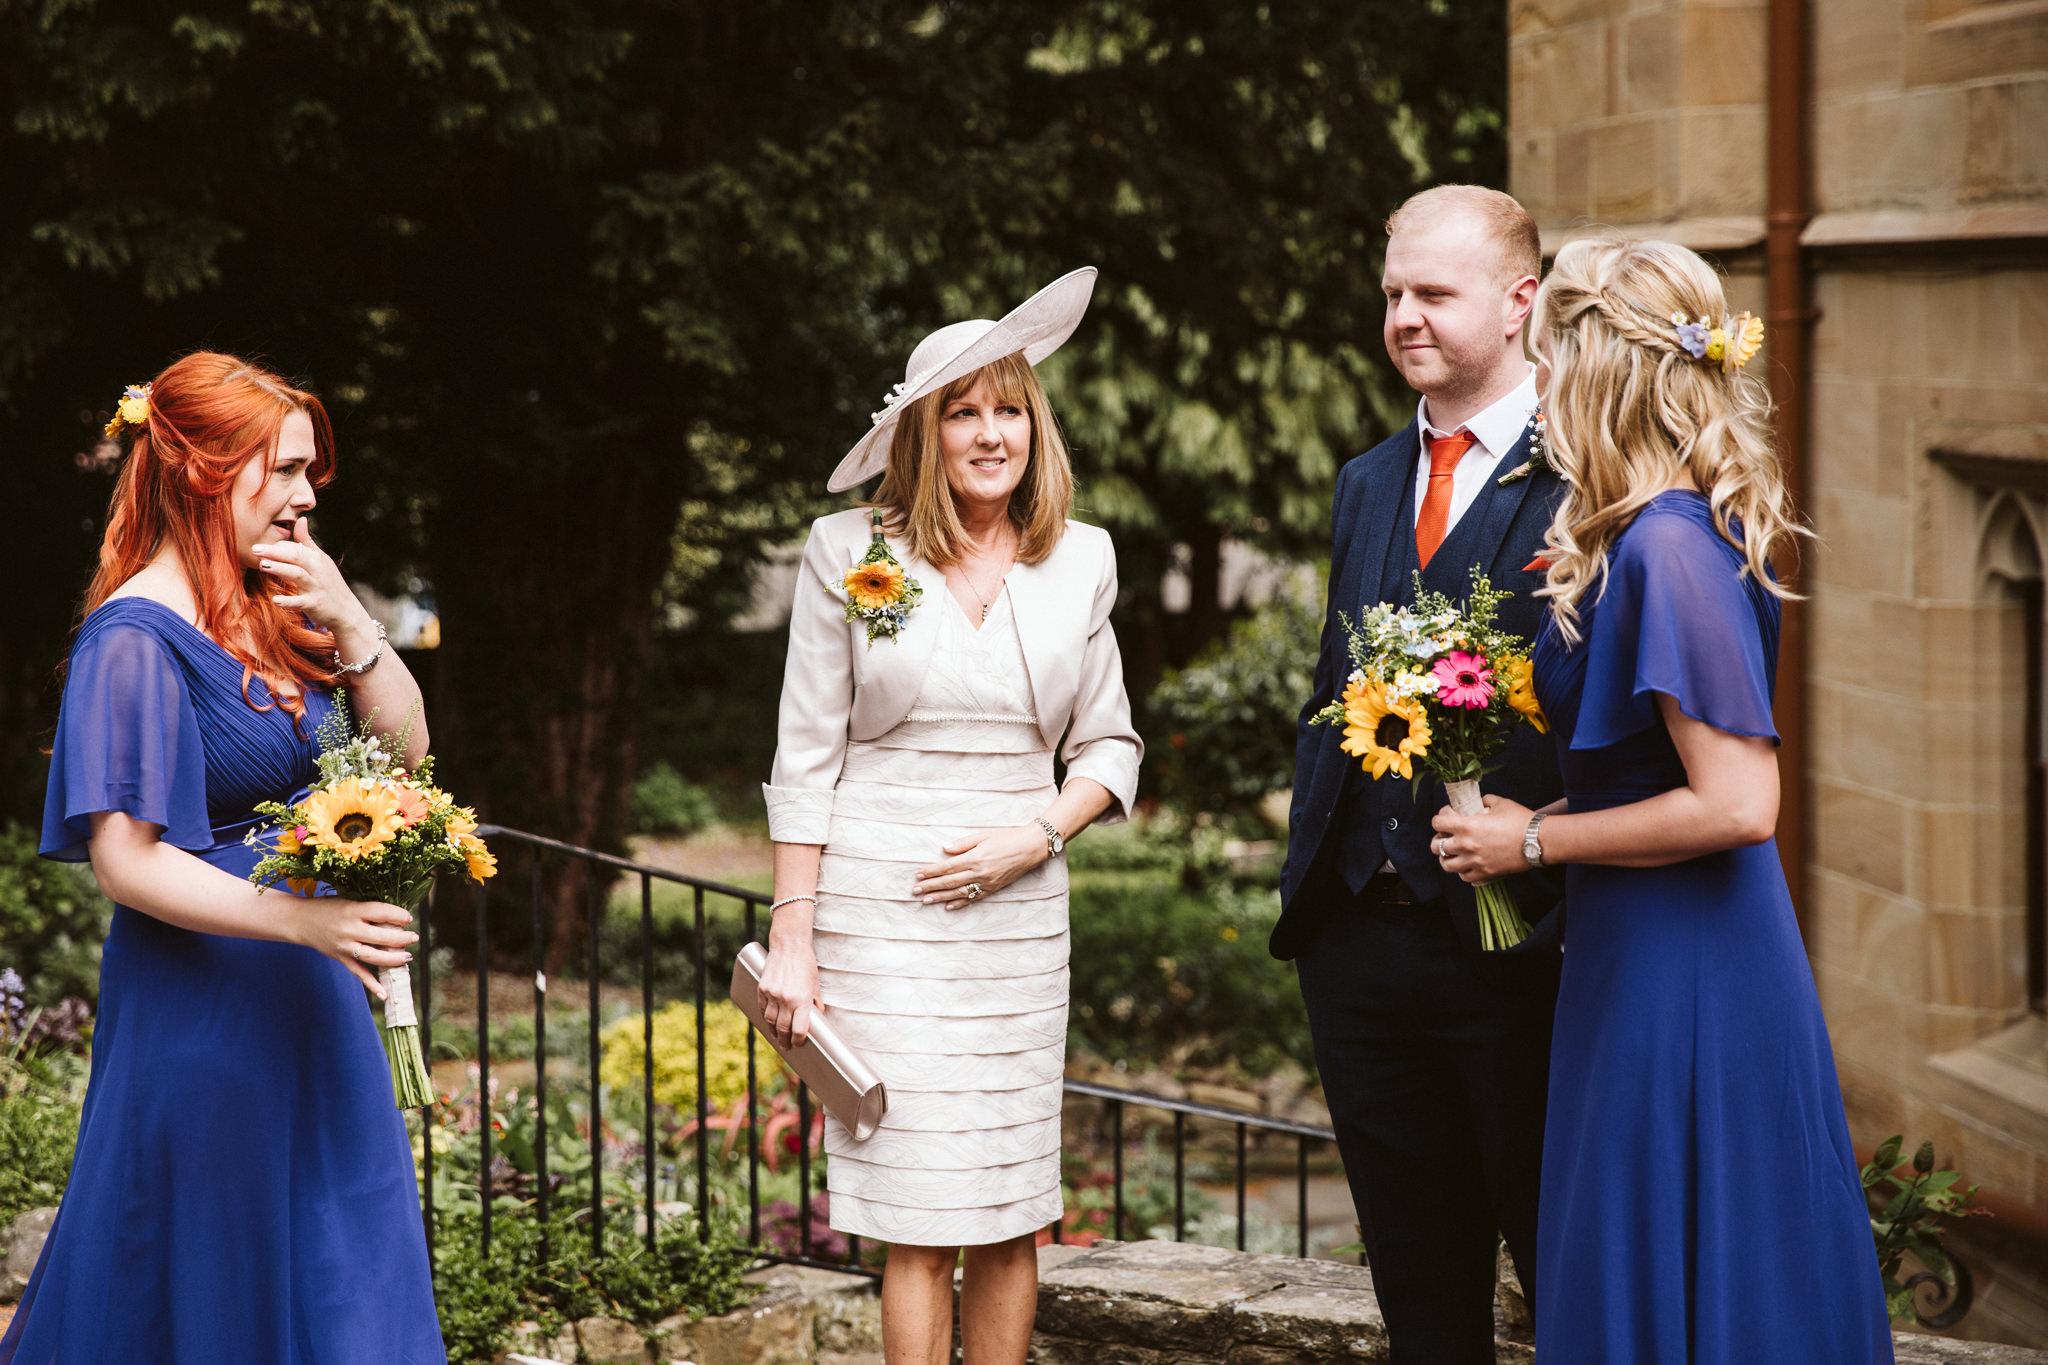 northside-farm-wedding-northumberland-margarita-hope (18).jpg